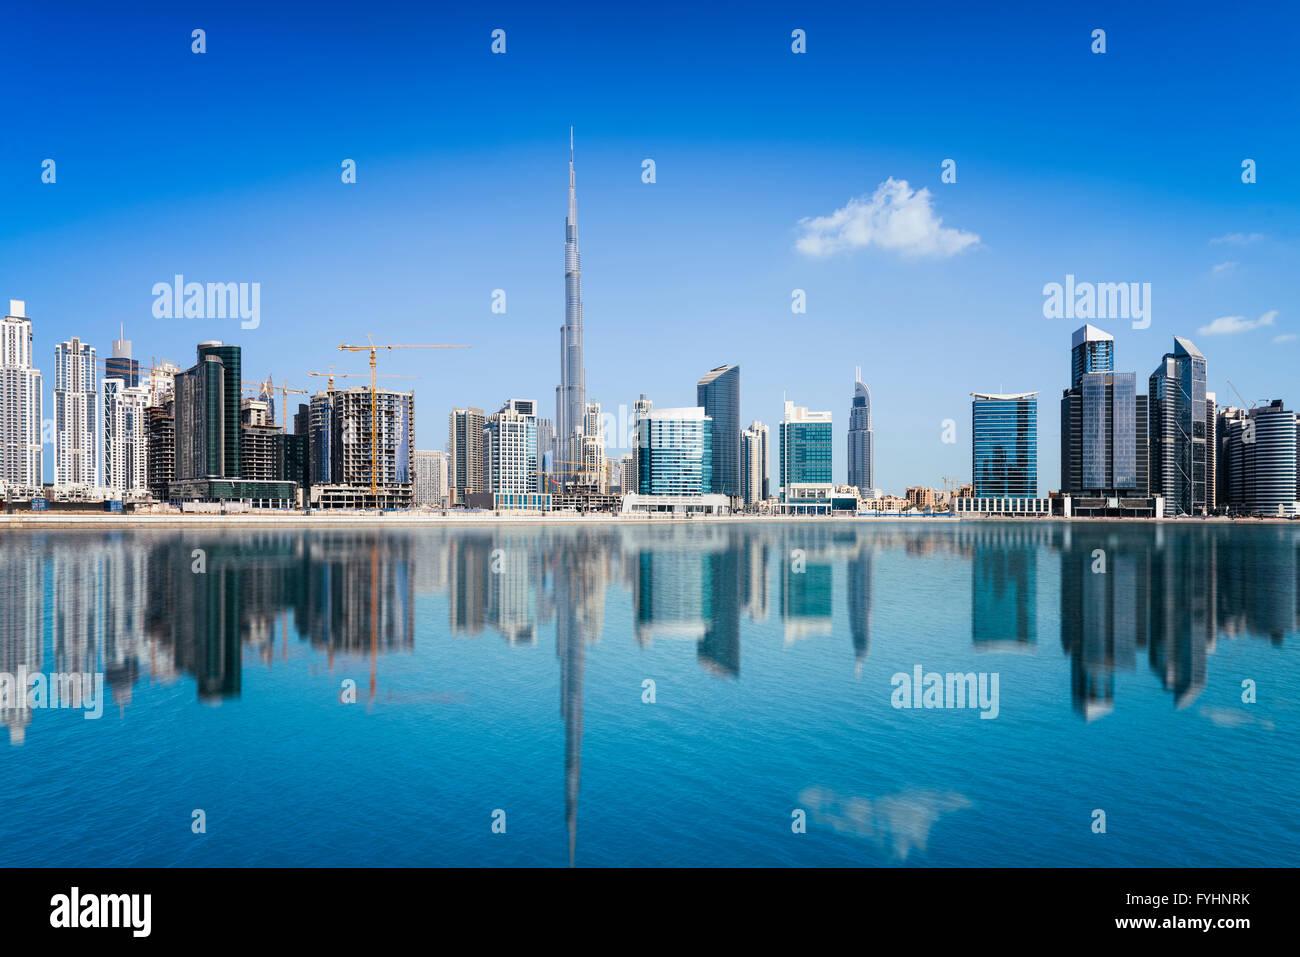 Skyline di Dubai, Emirati Arabi Uniti Immagini Stock